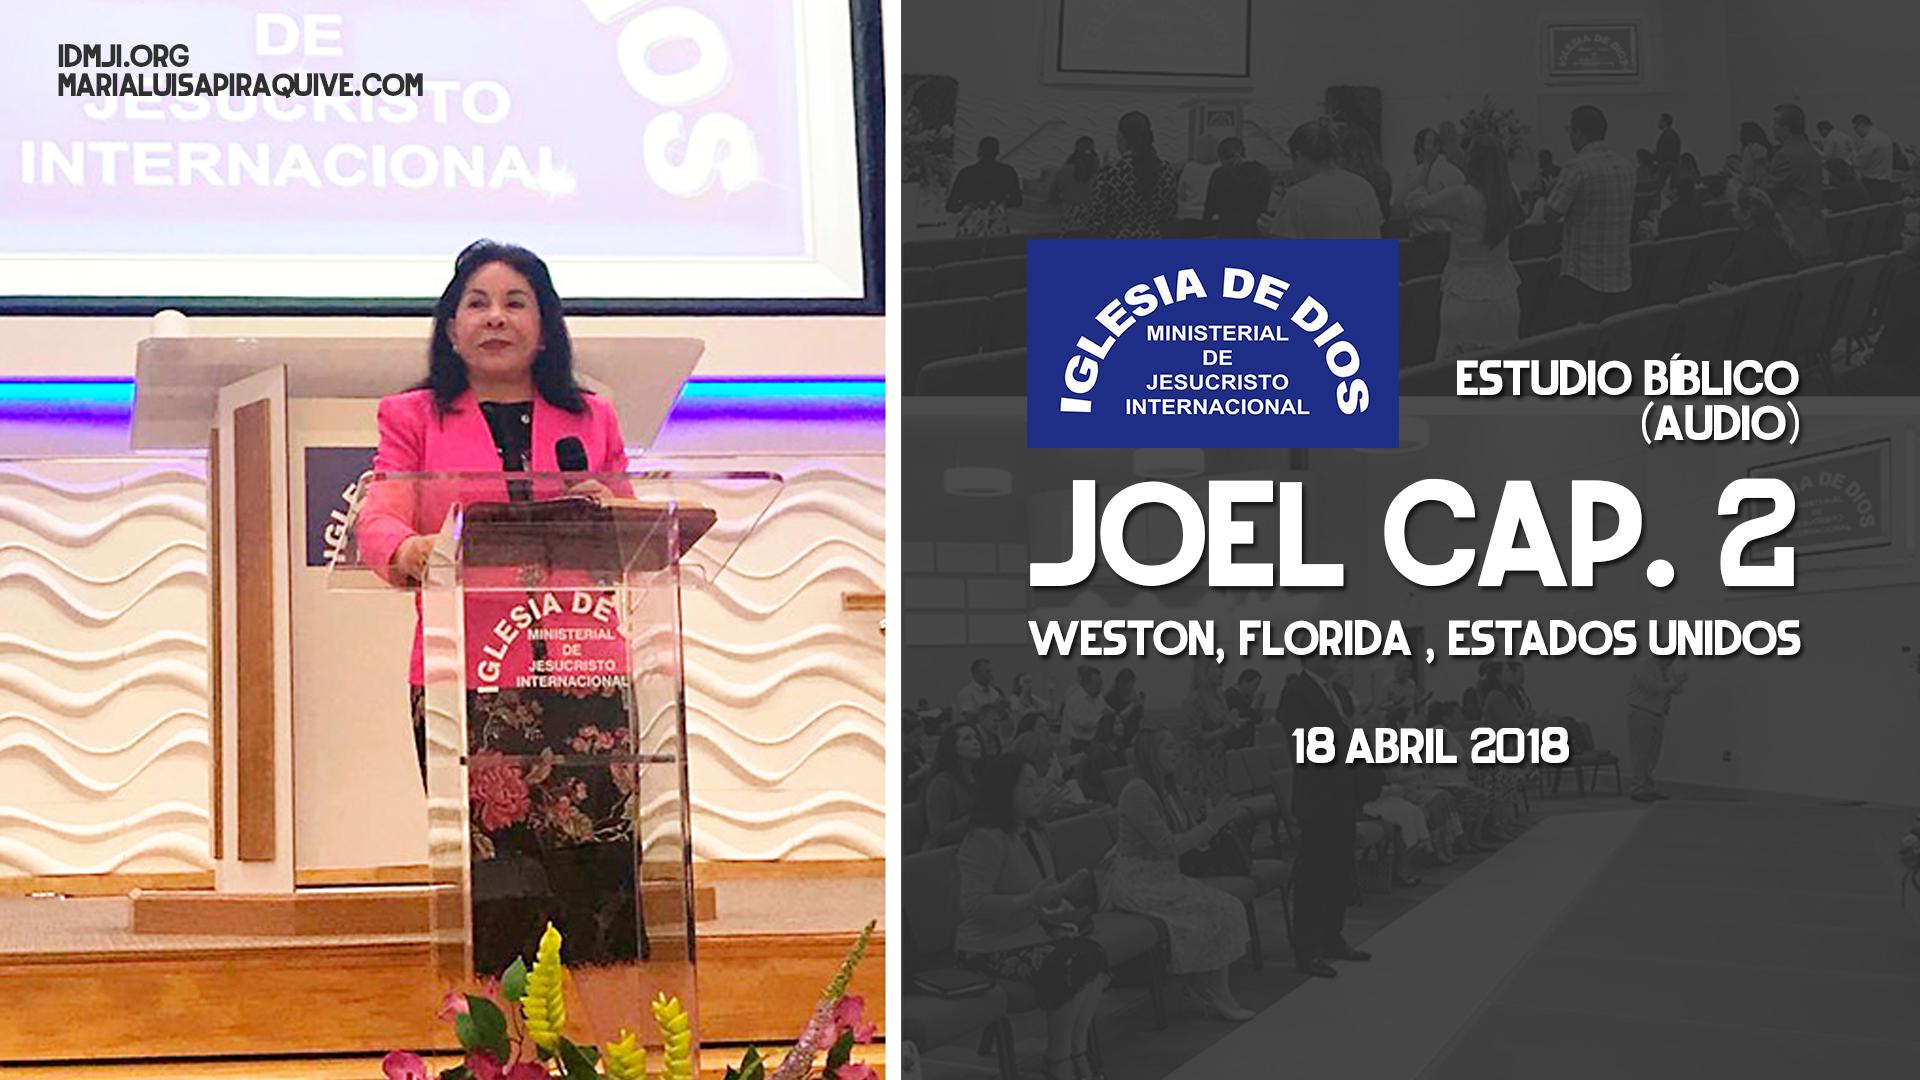 Audio: Estudio Bíblico Joel Cap. 2